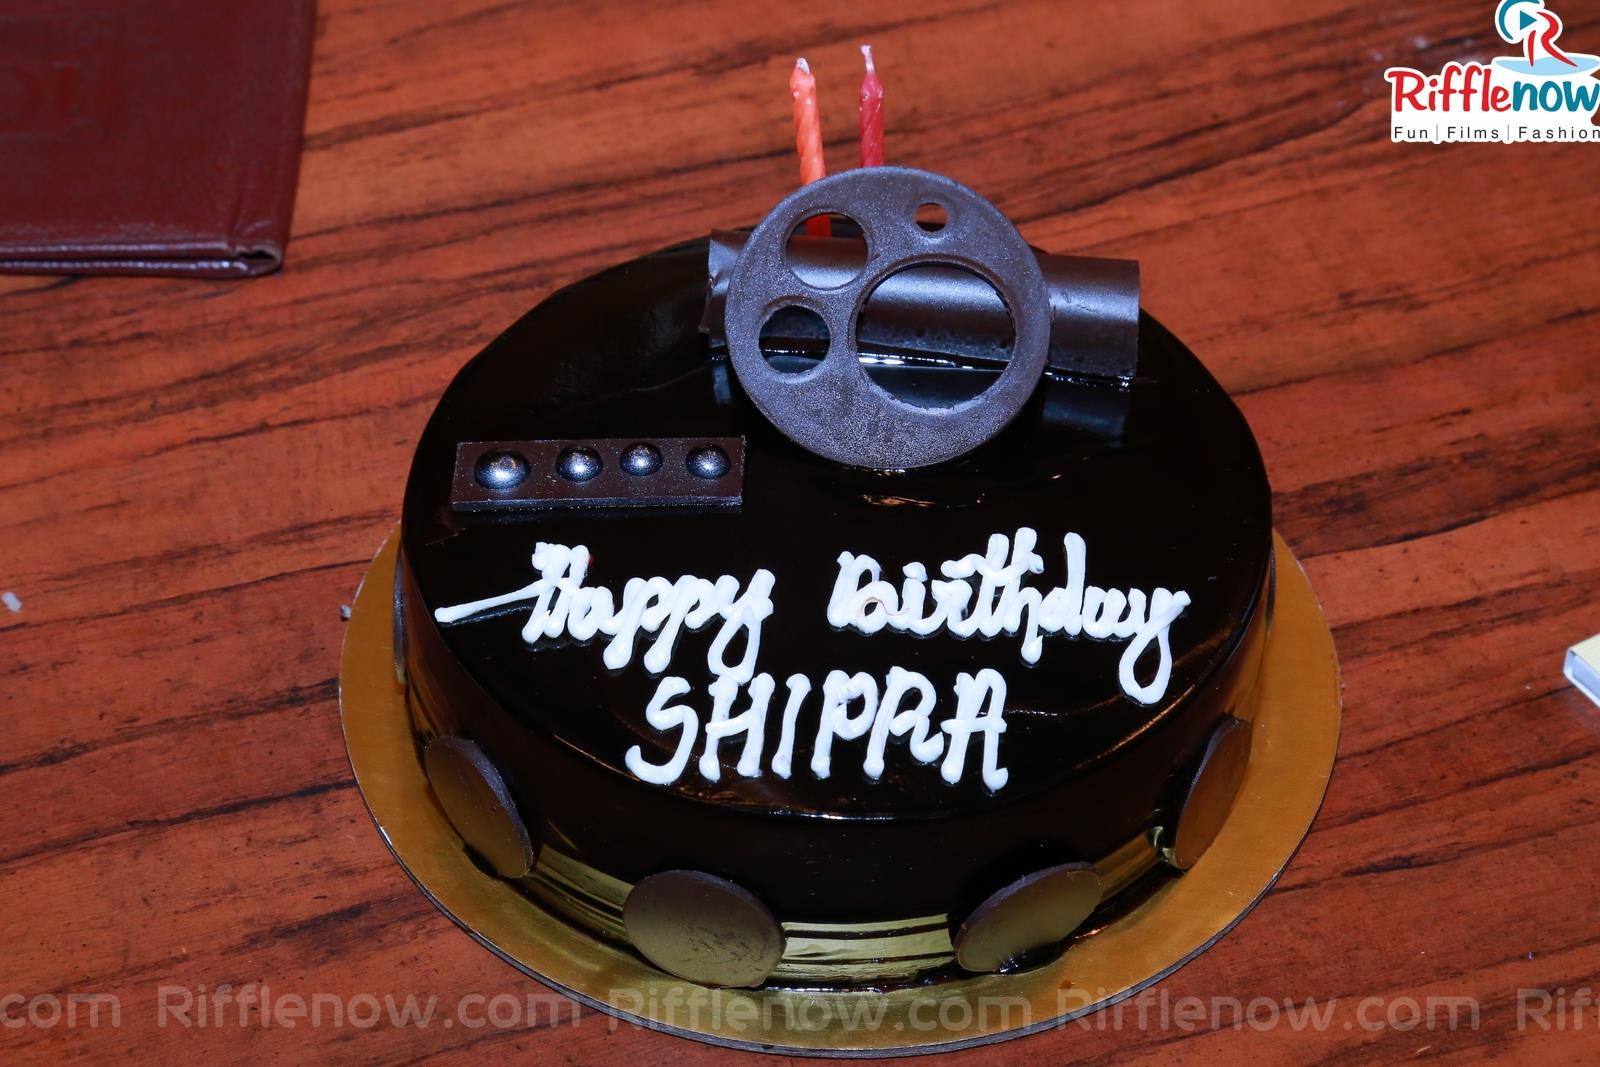 Image Of Birthday Cake With Name Swati